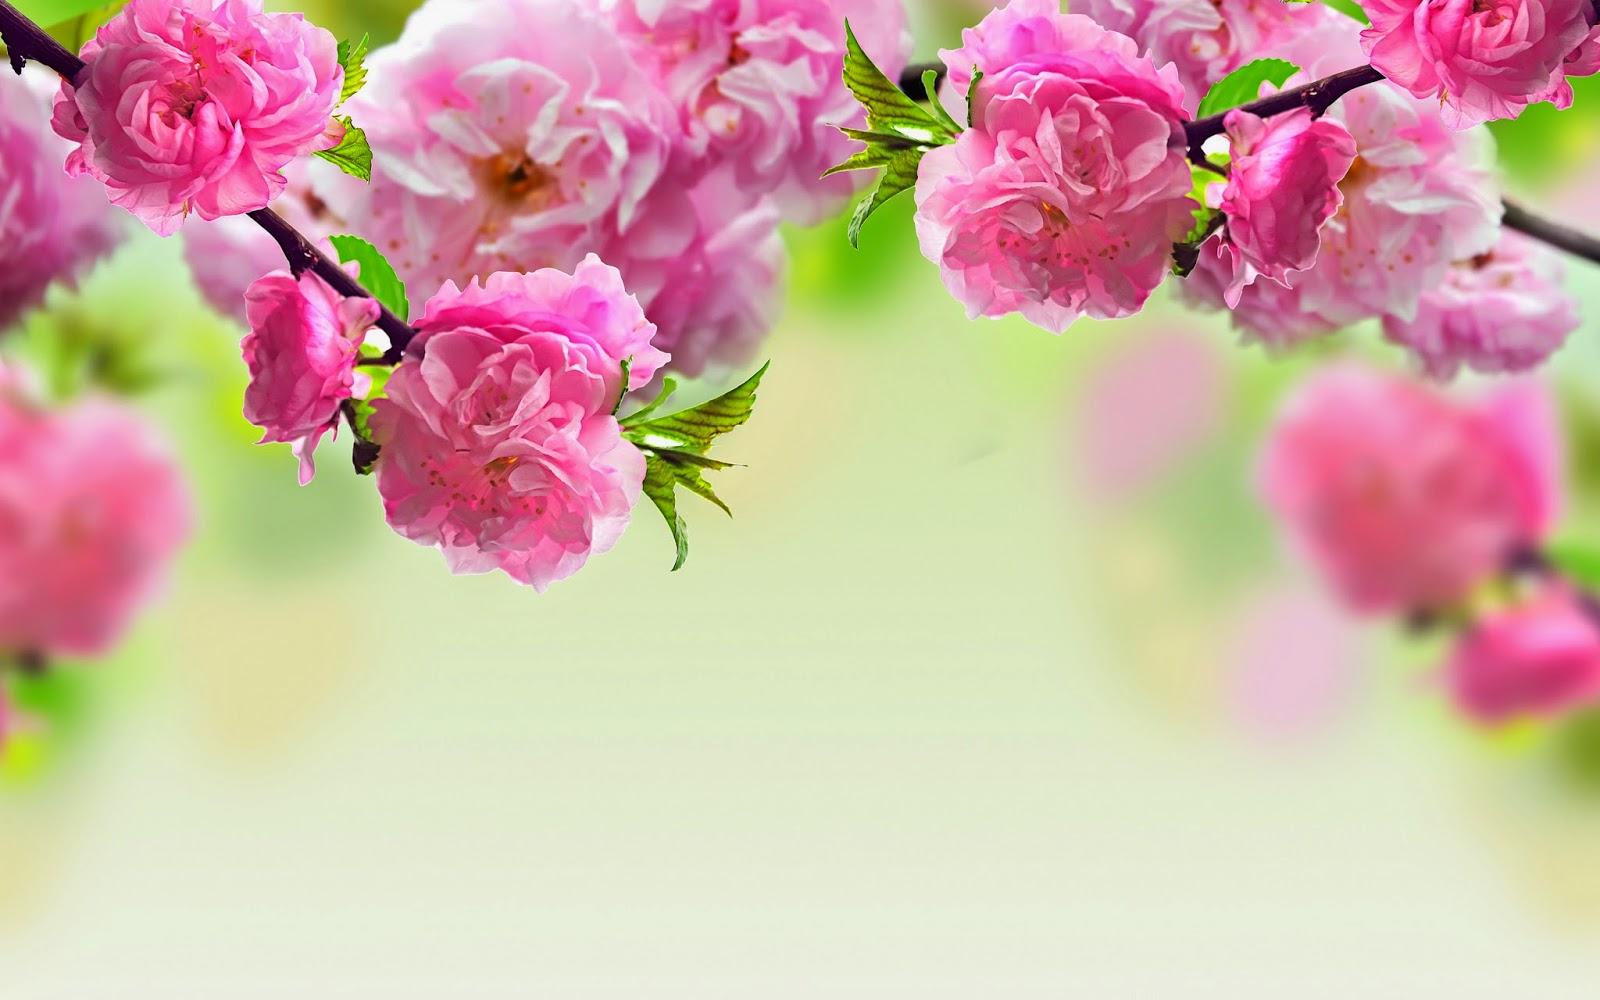 Spring season hd free wallpapers hd wallpaper spring season hd free wallpapers mightylinksfo